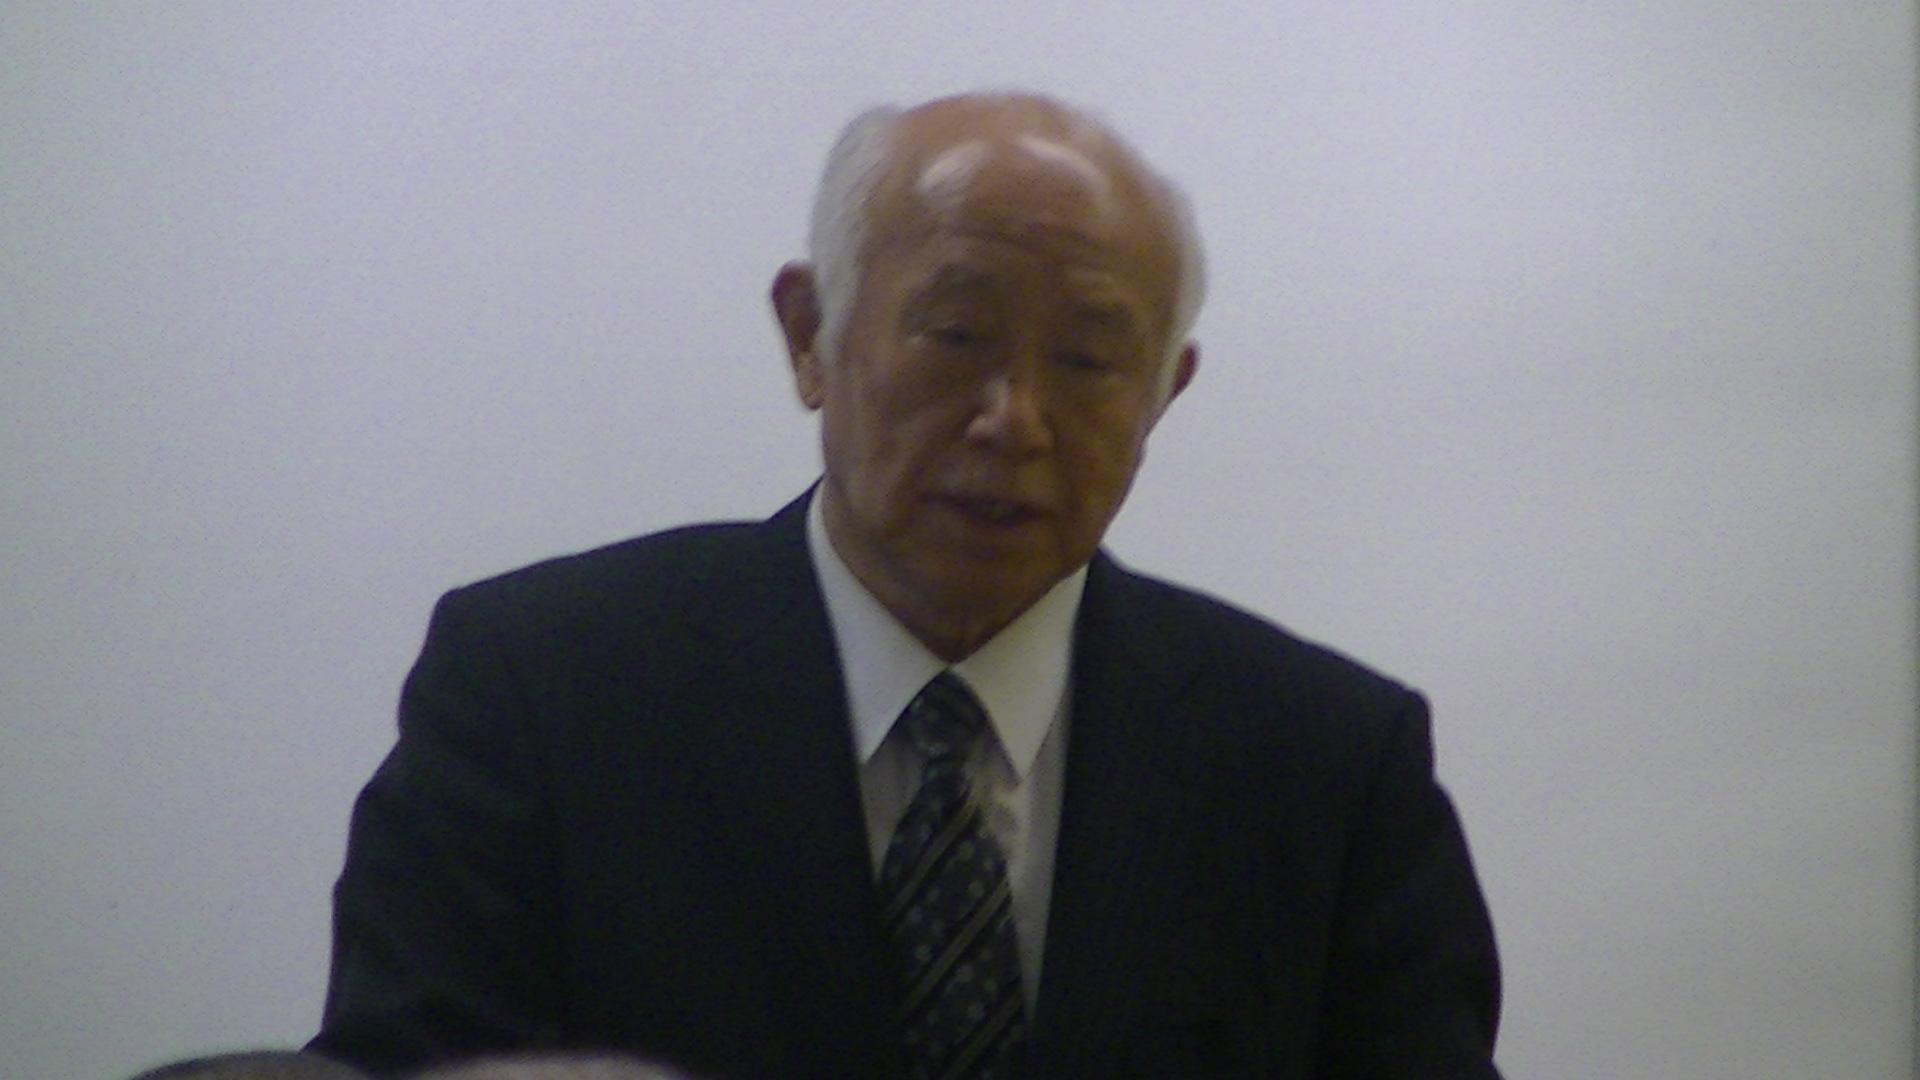 PIC 0092 - 4月1日東京思風塾の開催になります。